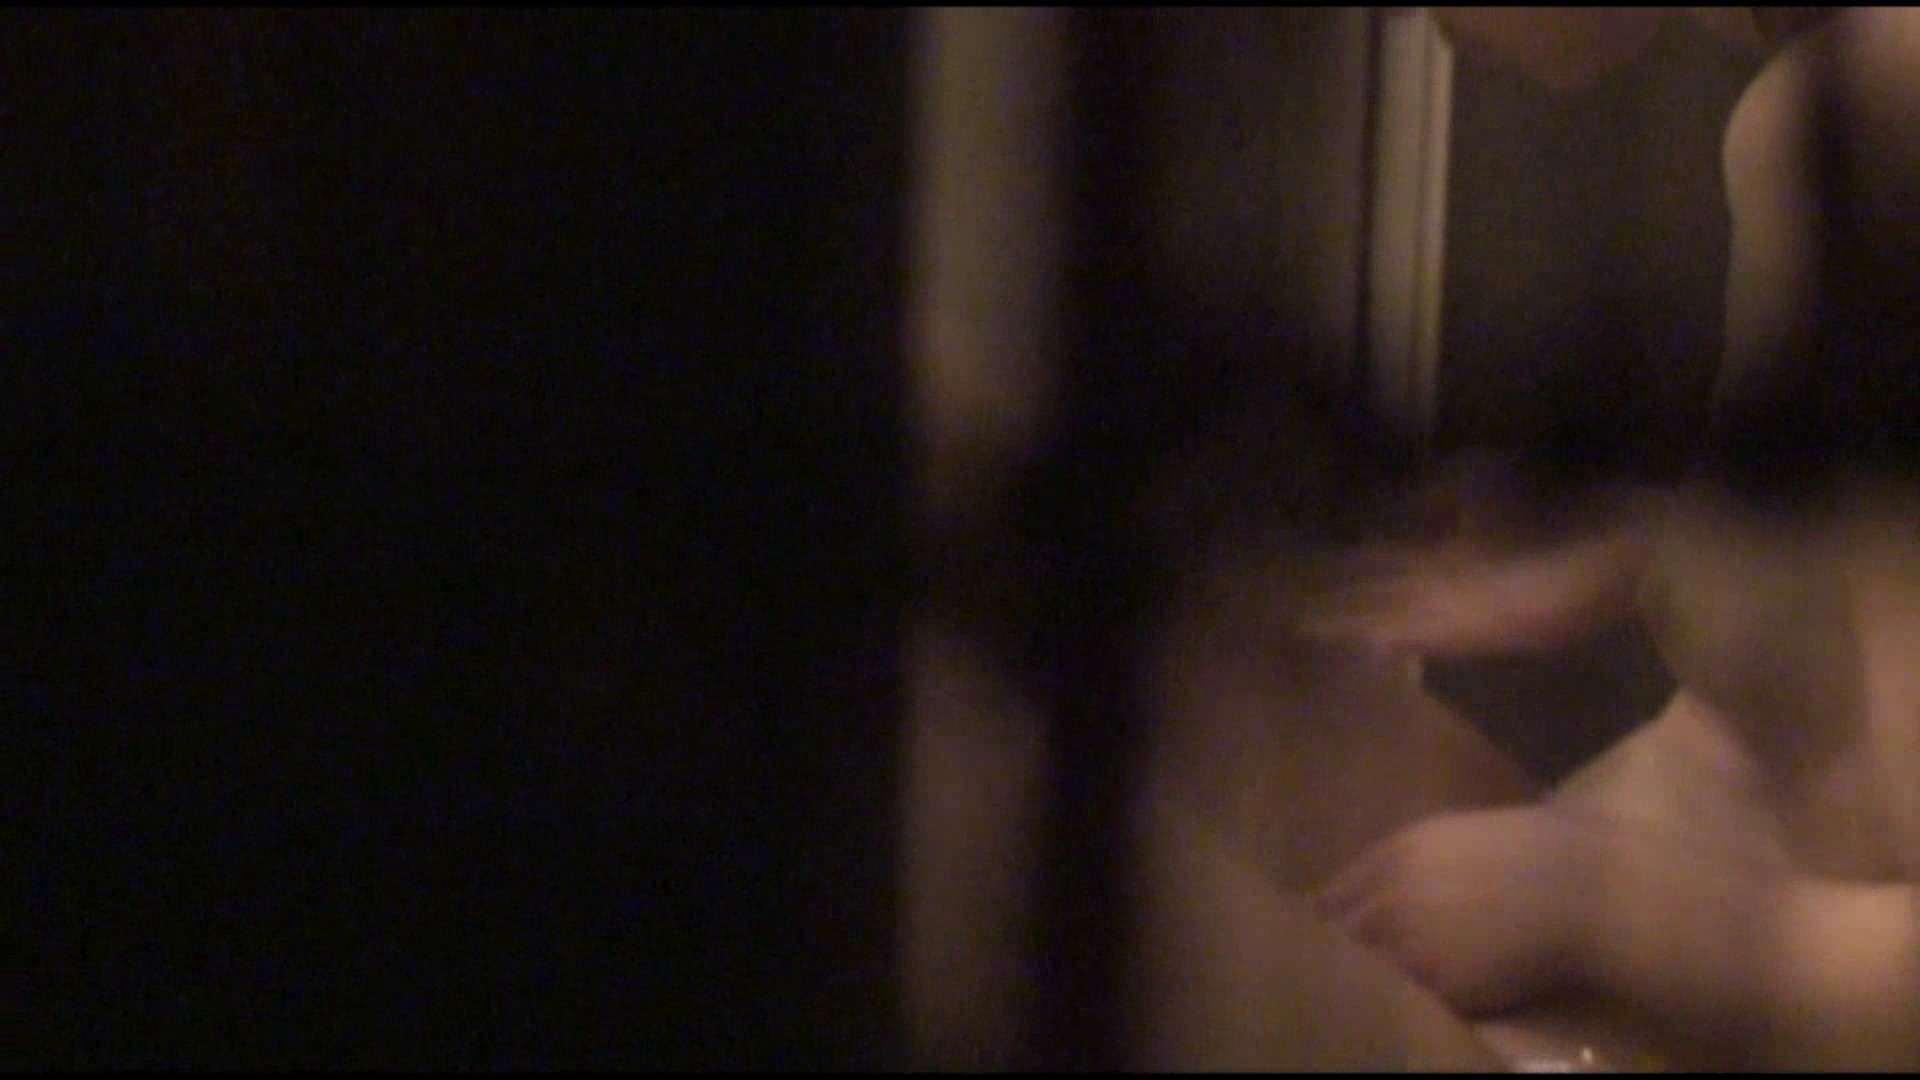 vol.05最高の極上美人!可愛い彼女の裸体をどうぞ!風呂上り鏡チェックも必見! 美人  99PIX 56